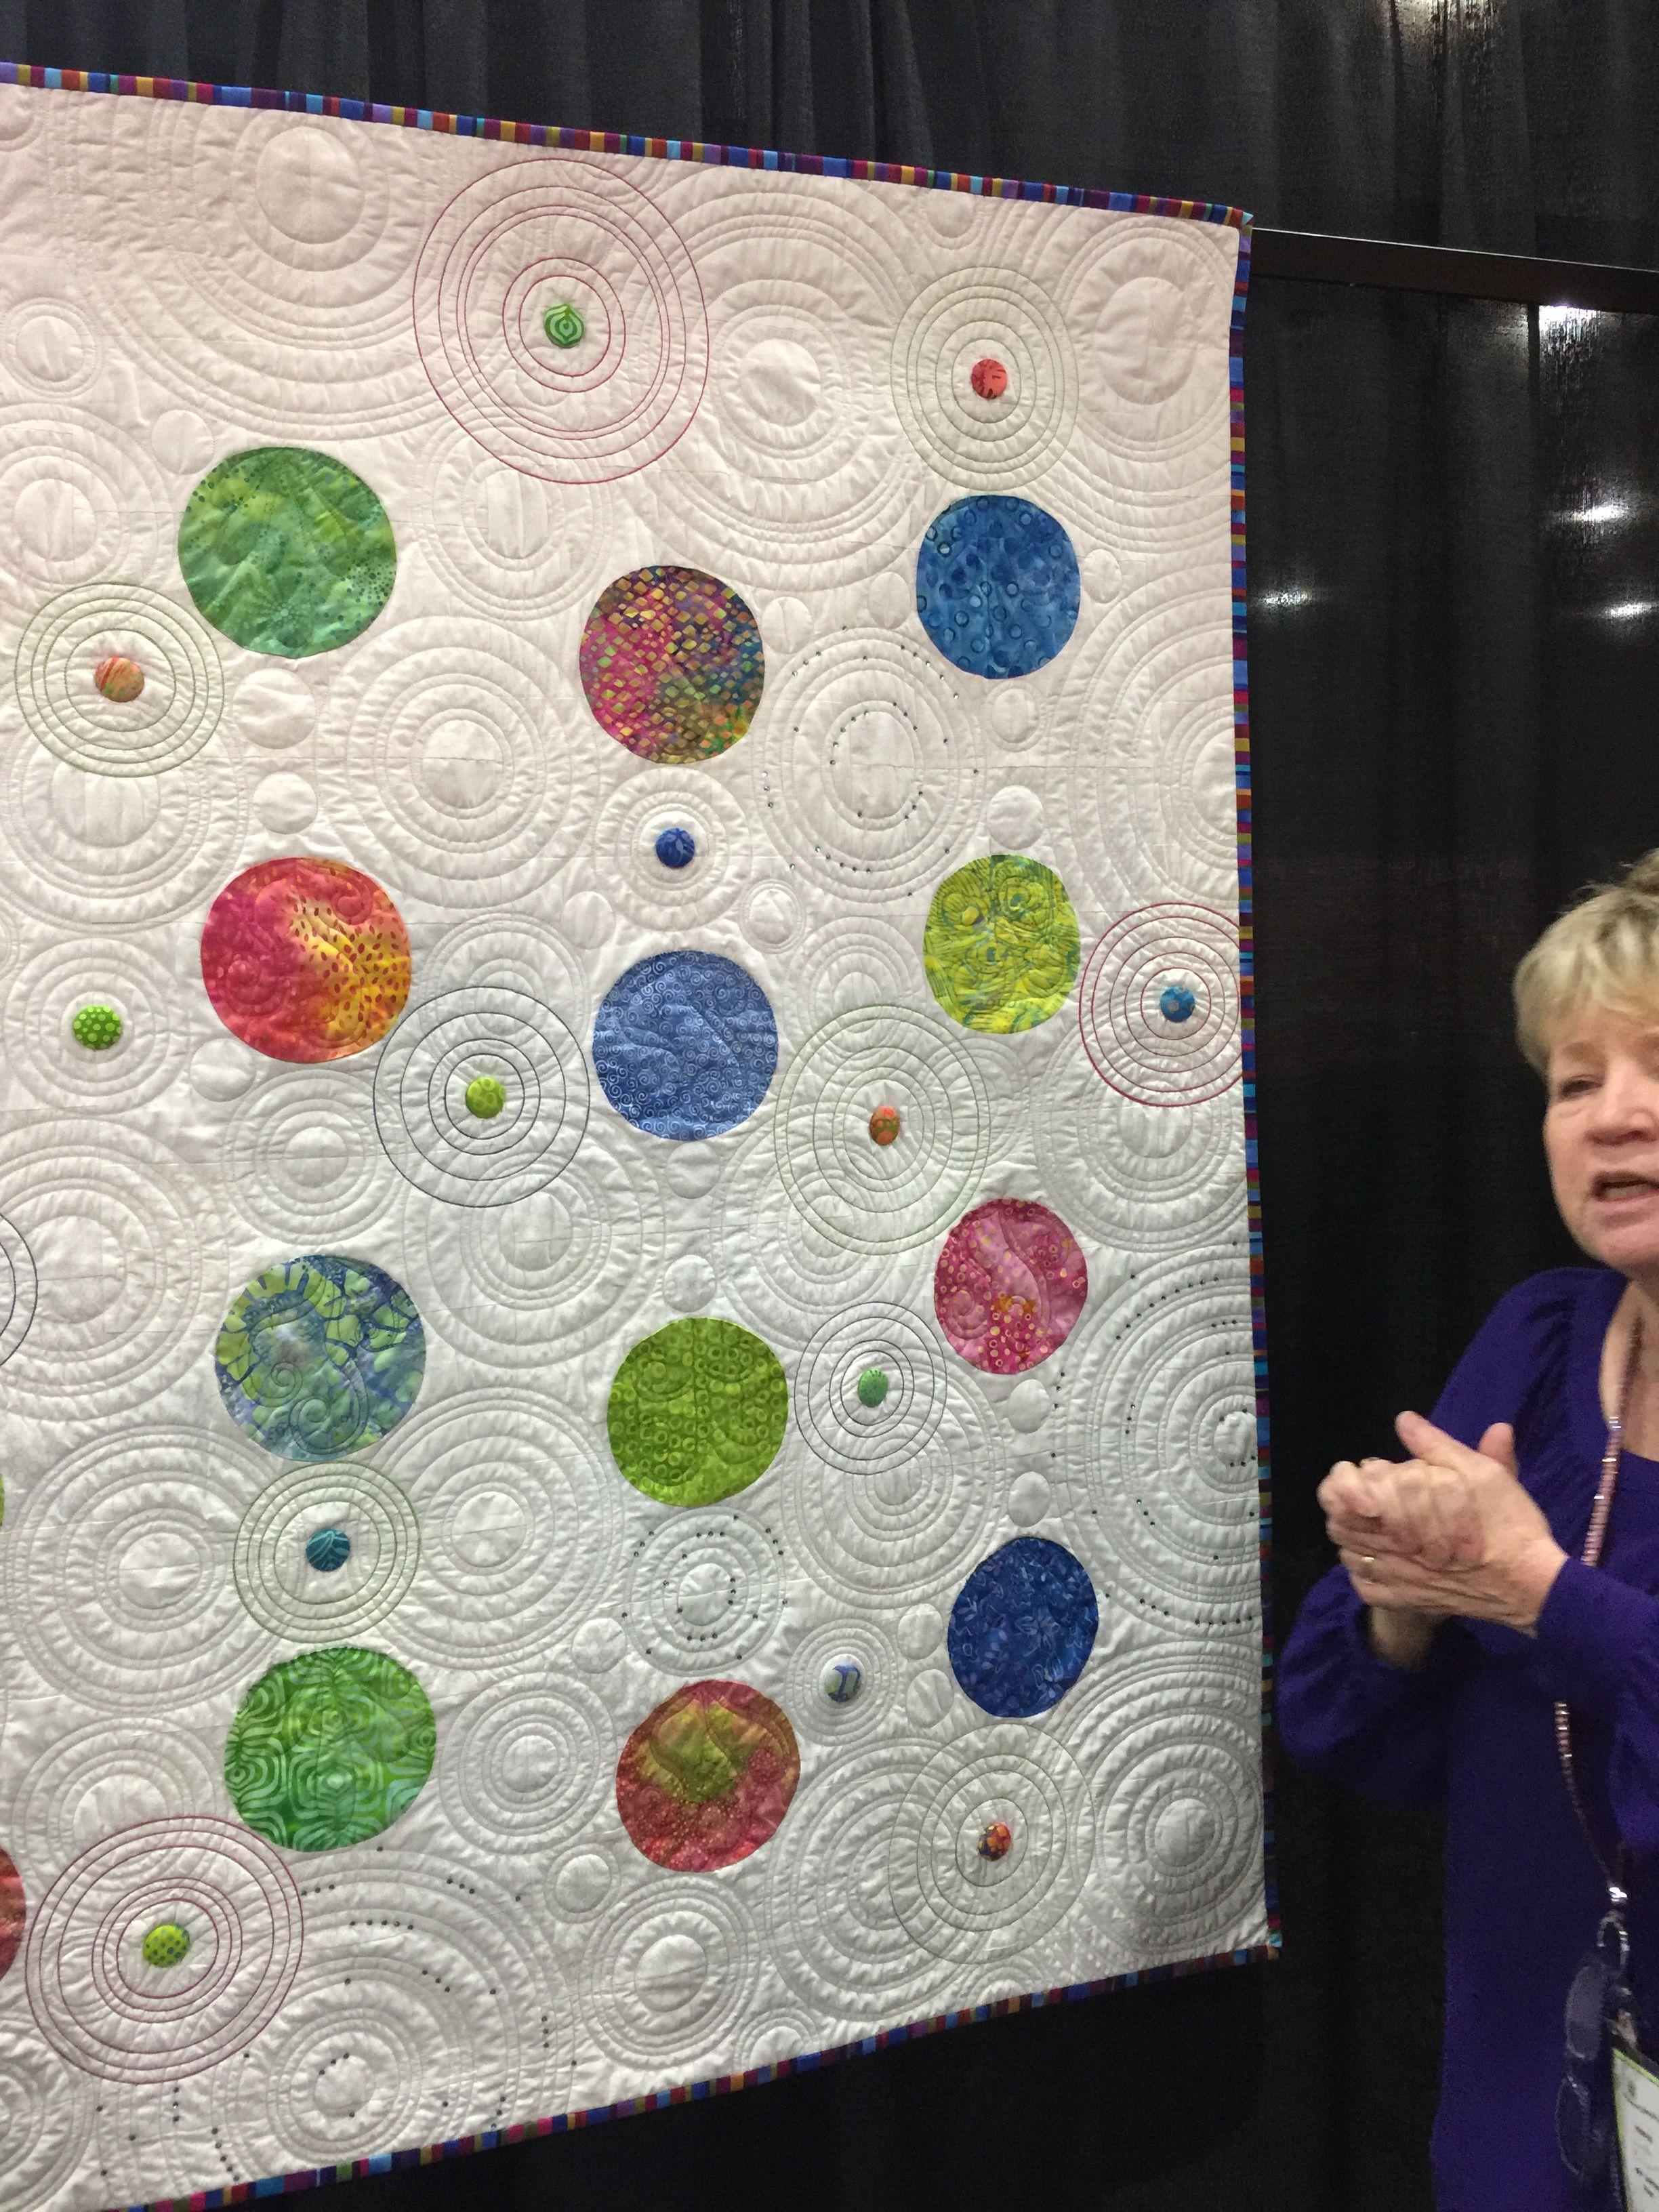 Quilt of Linda Reinert Quilting with Circles Pinterest